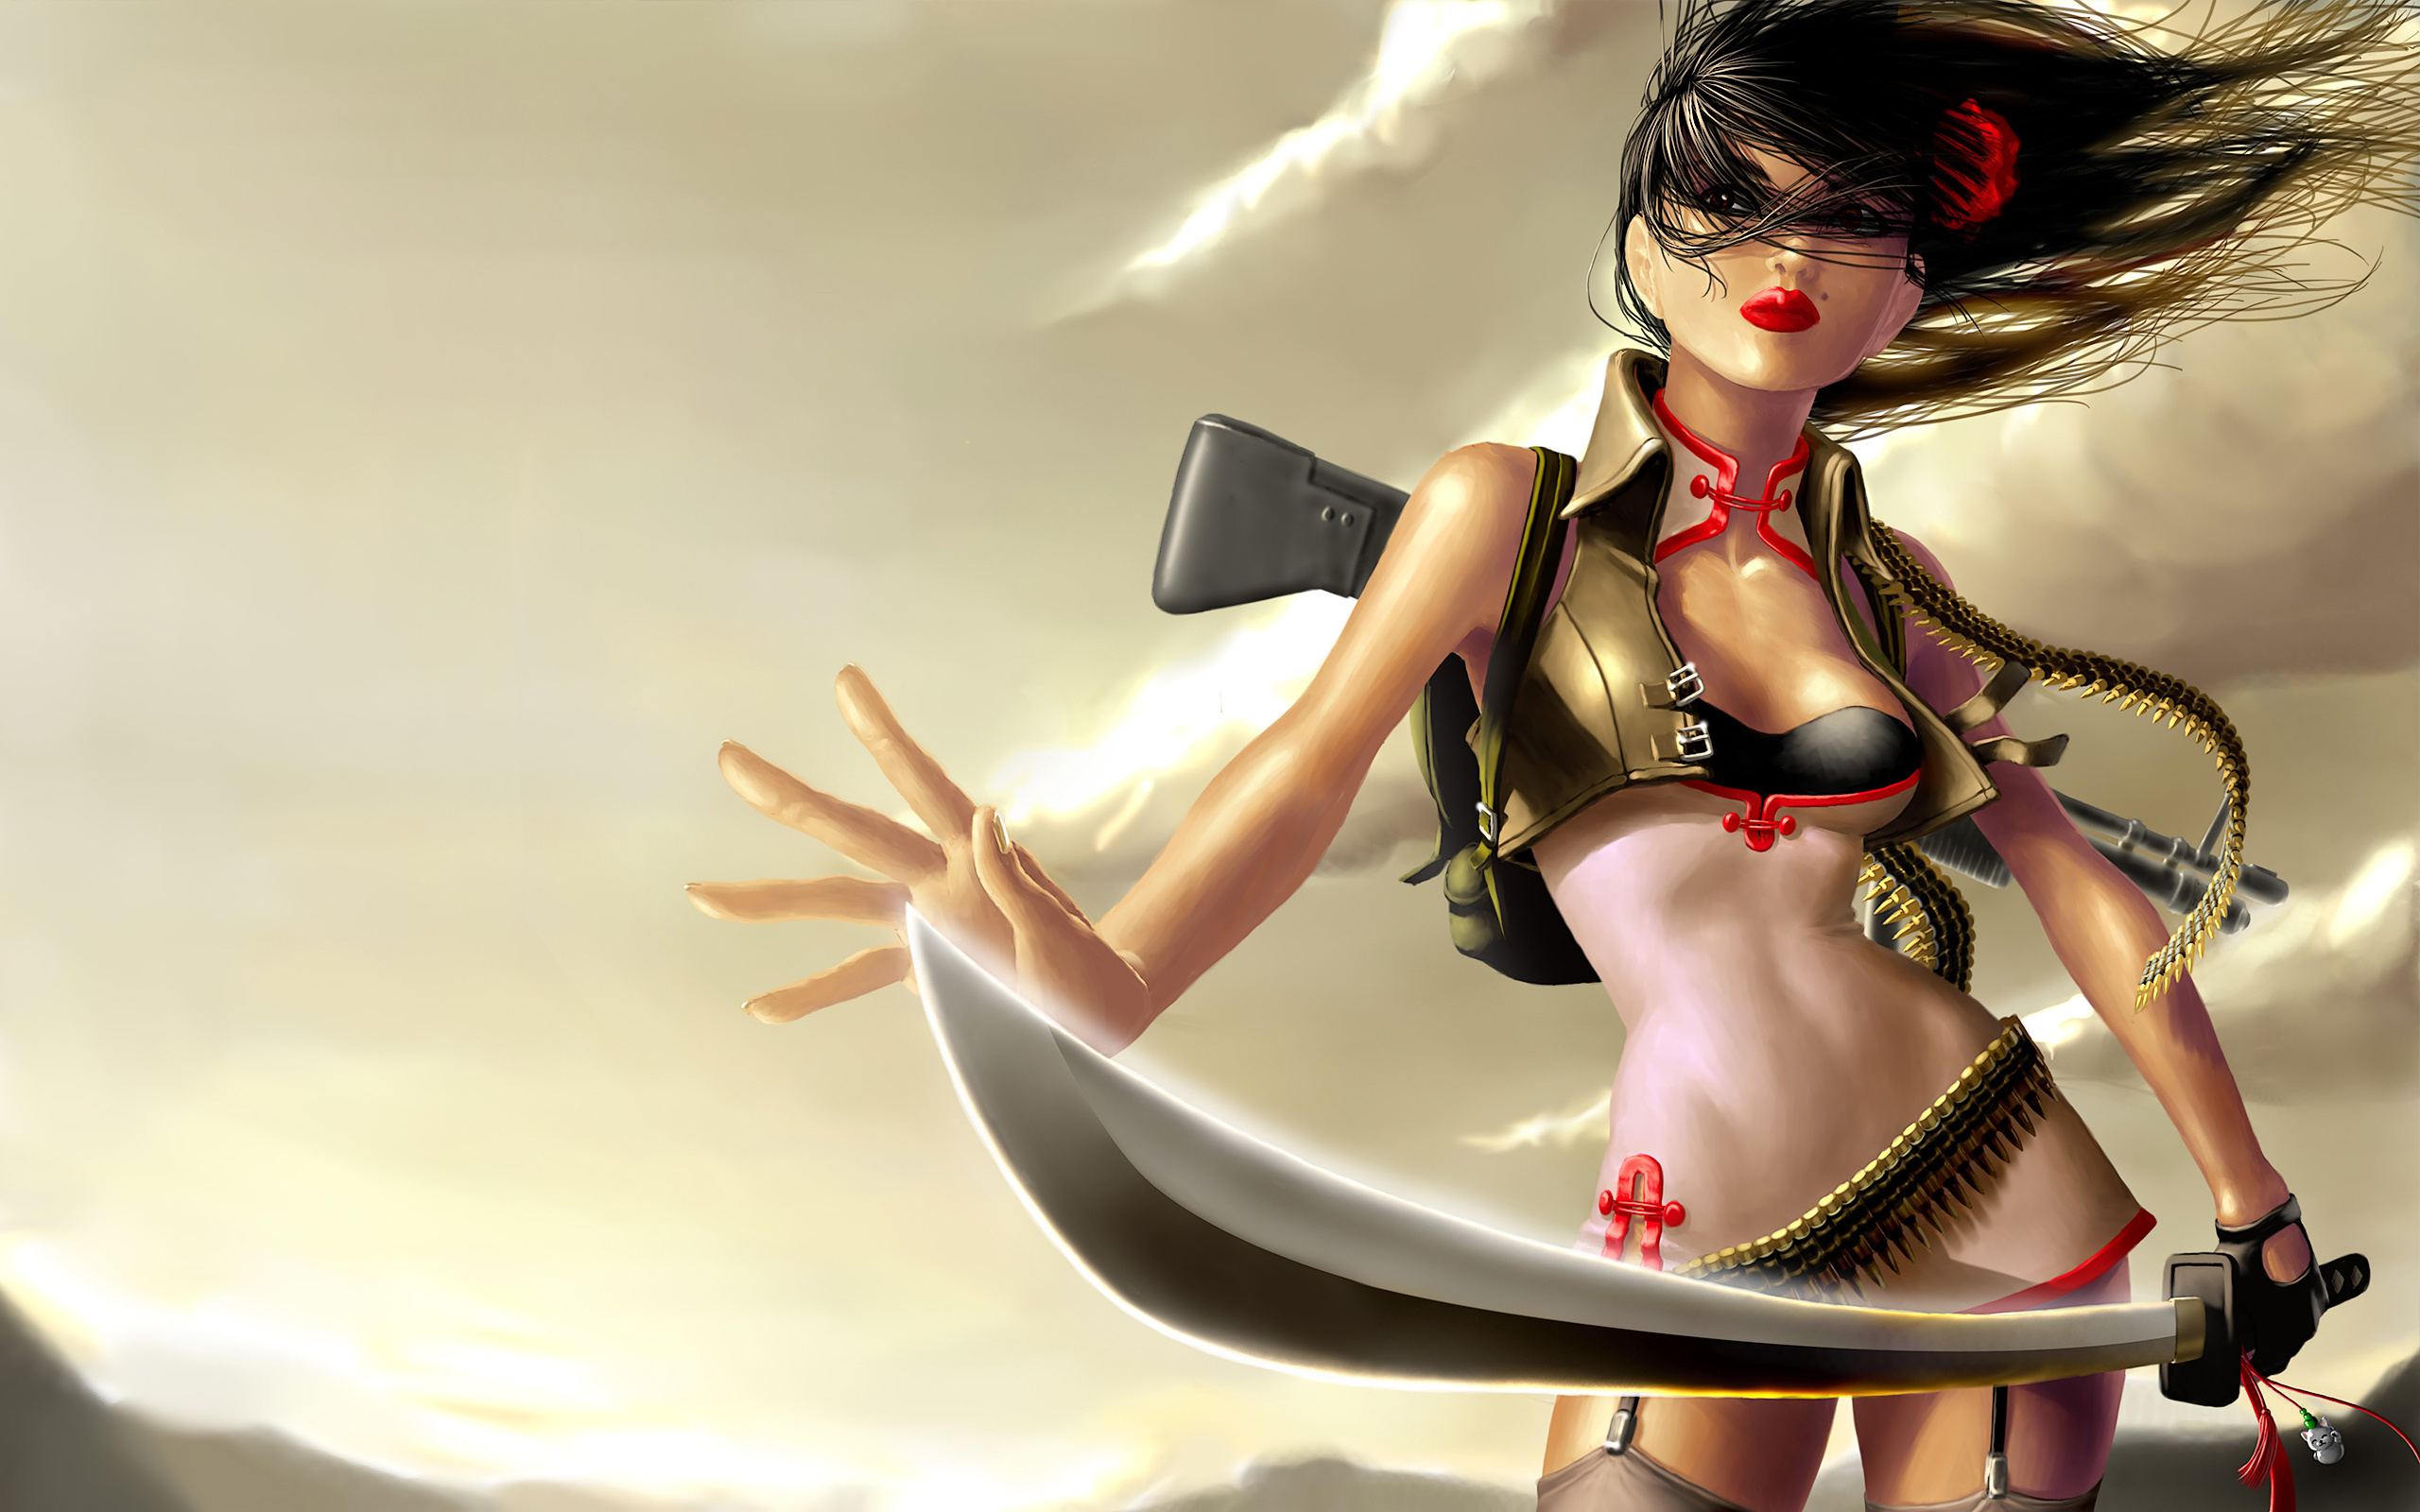 Sexy assassin girl